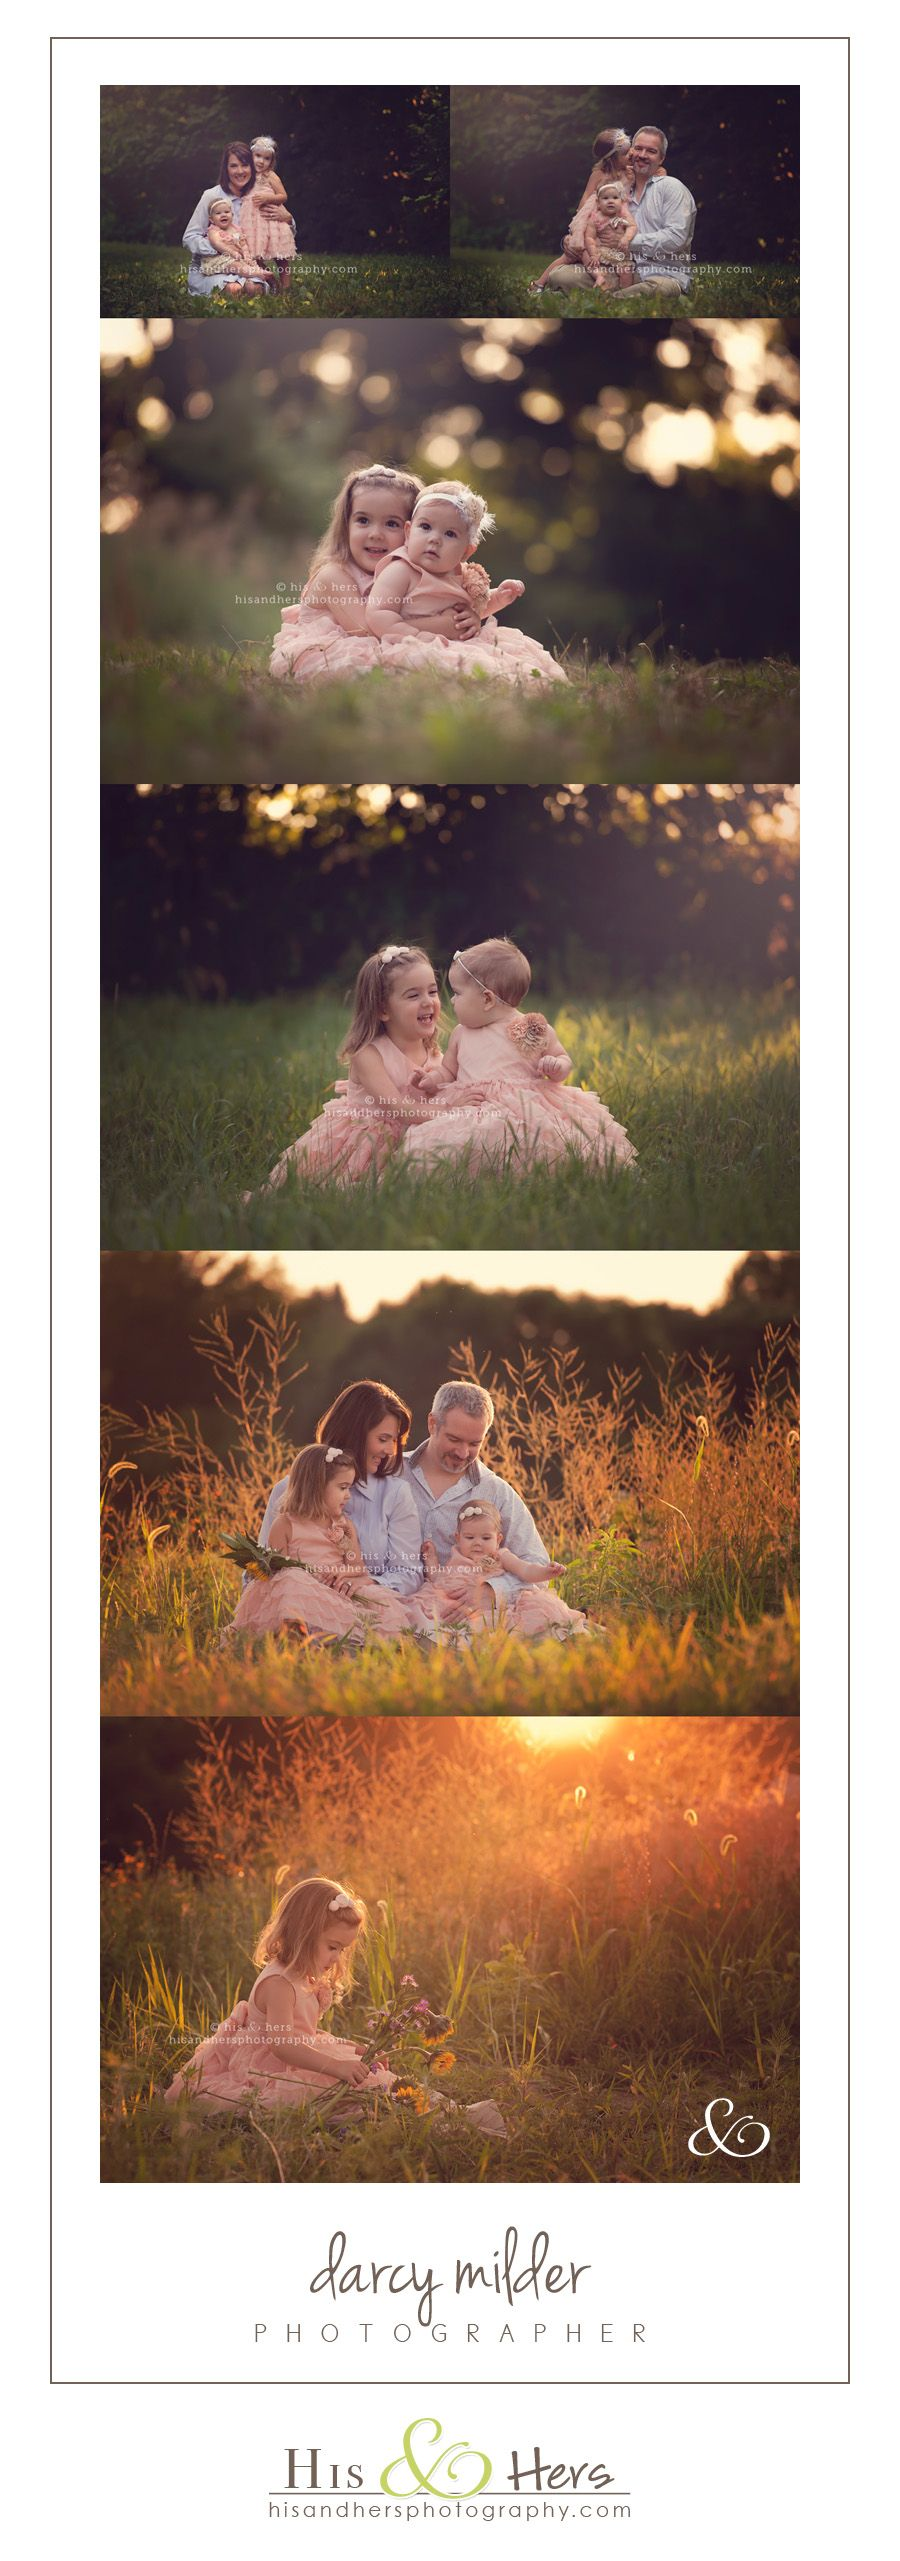 Family | Matthew & Rachel + girls, Des Moines, Iowa Family Photographer